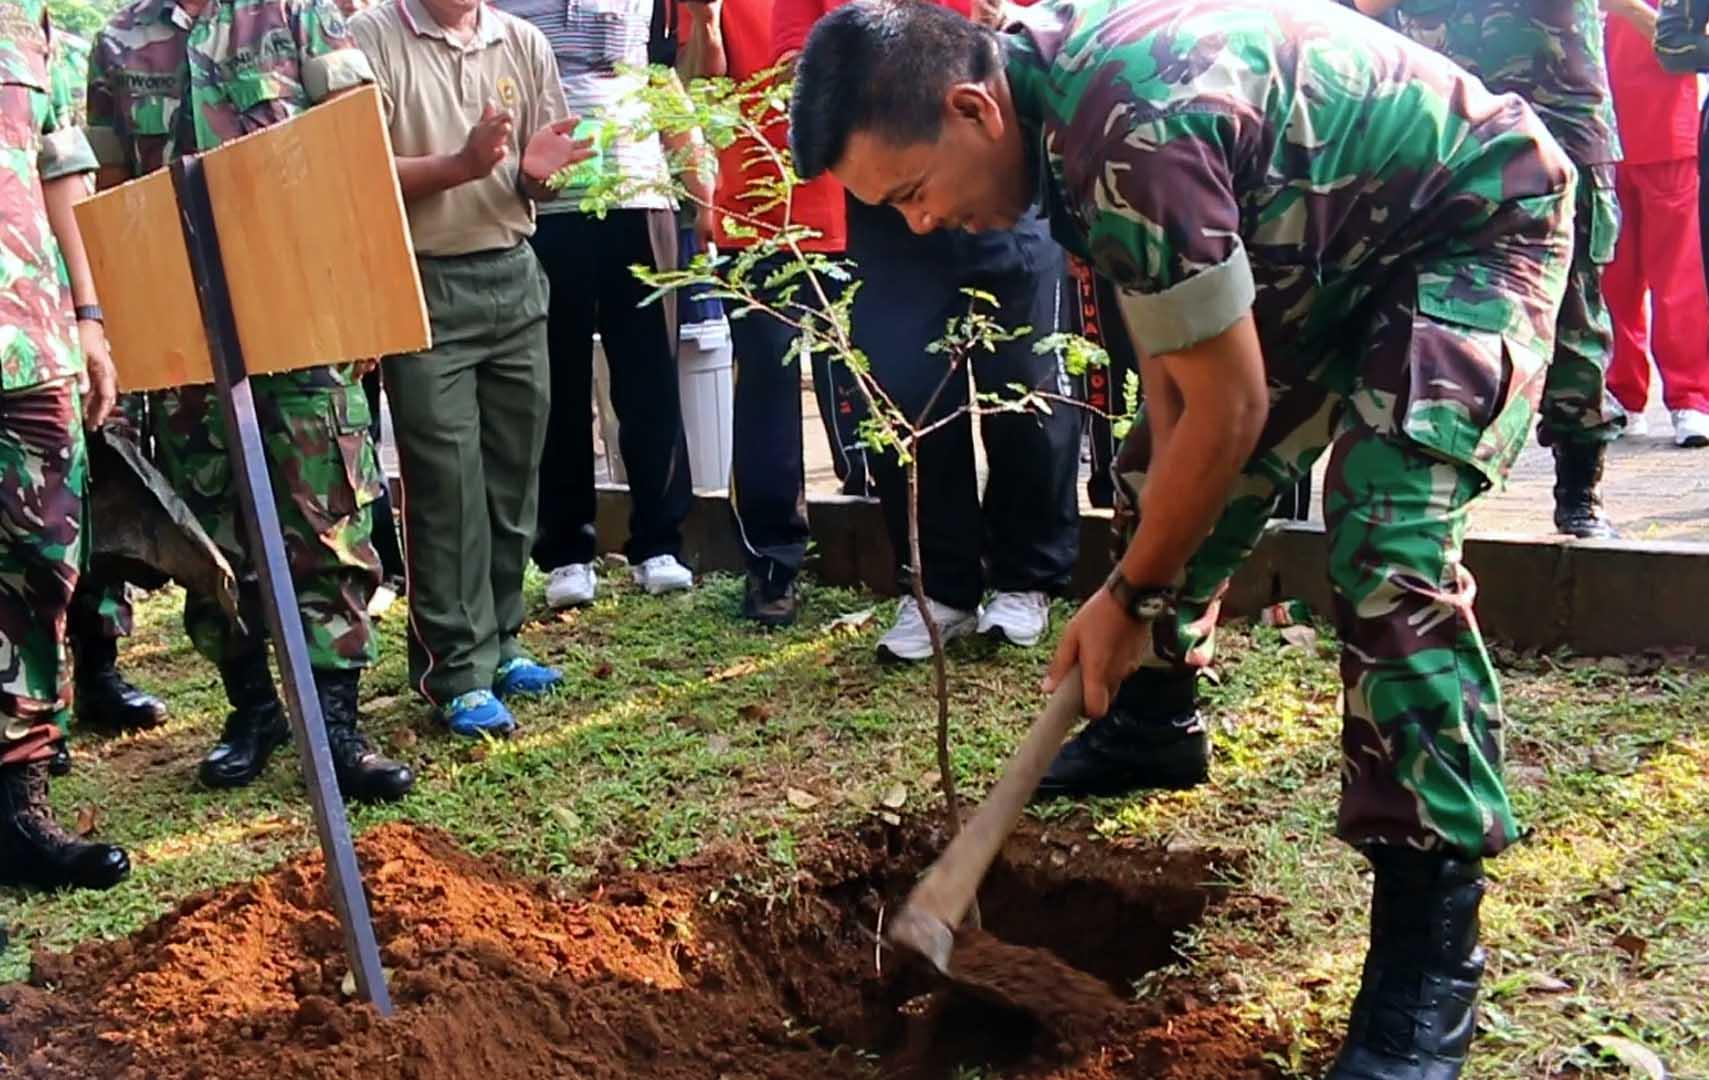 Pilih Pohon Tepat, Keuntungan Ganda Didapat